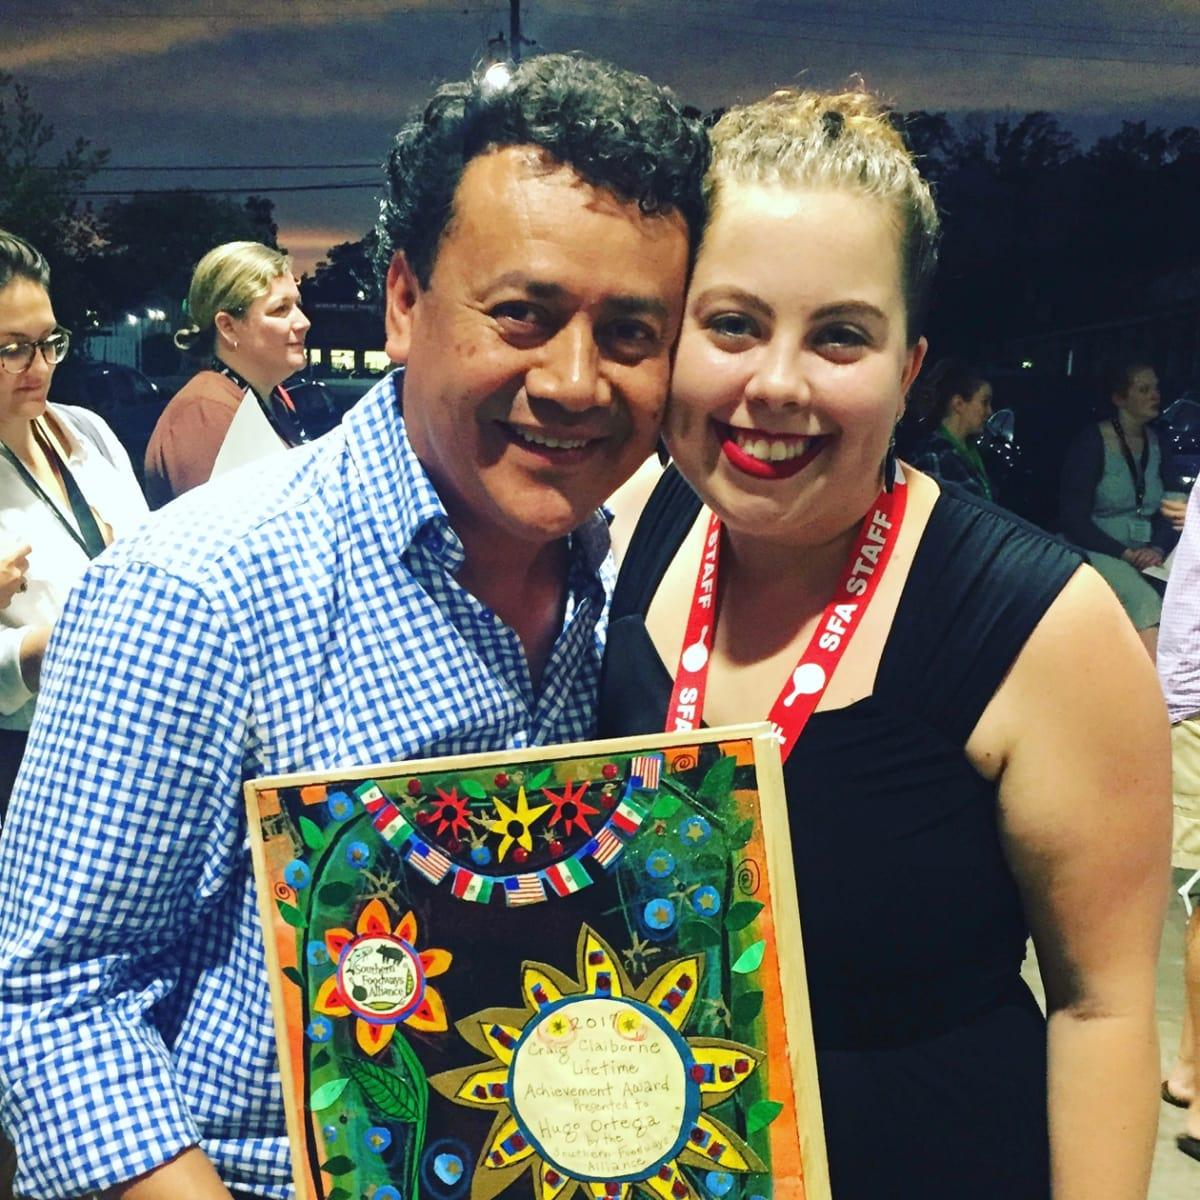 Hugo Ortega Ava Lowery Southern Foodways Alliance